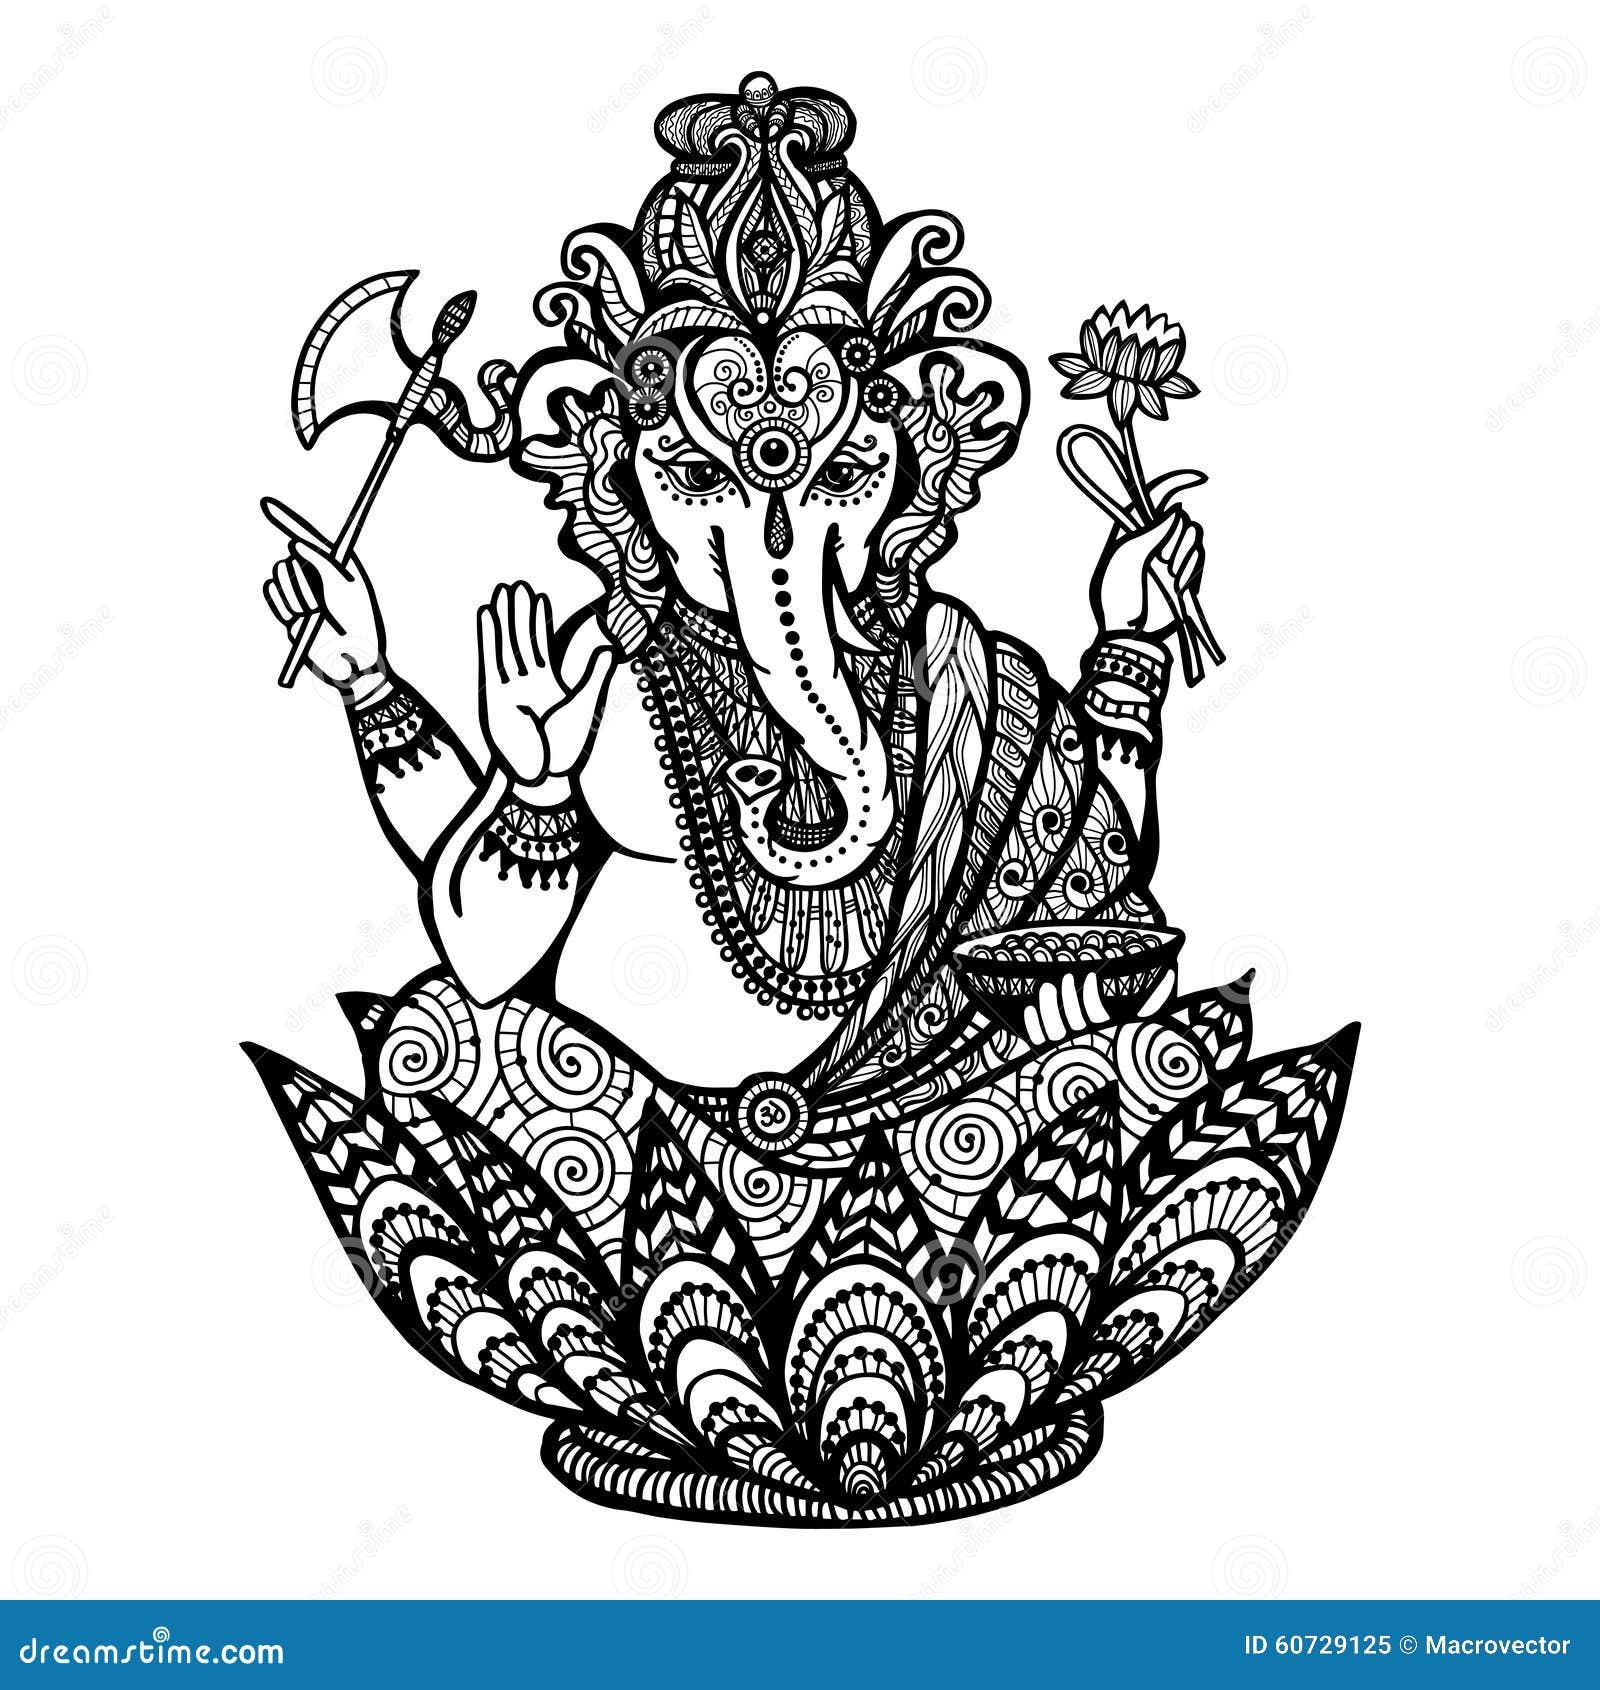 Decorative Ganesha Illustration Stock Vector - Image: 60729125